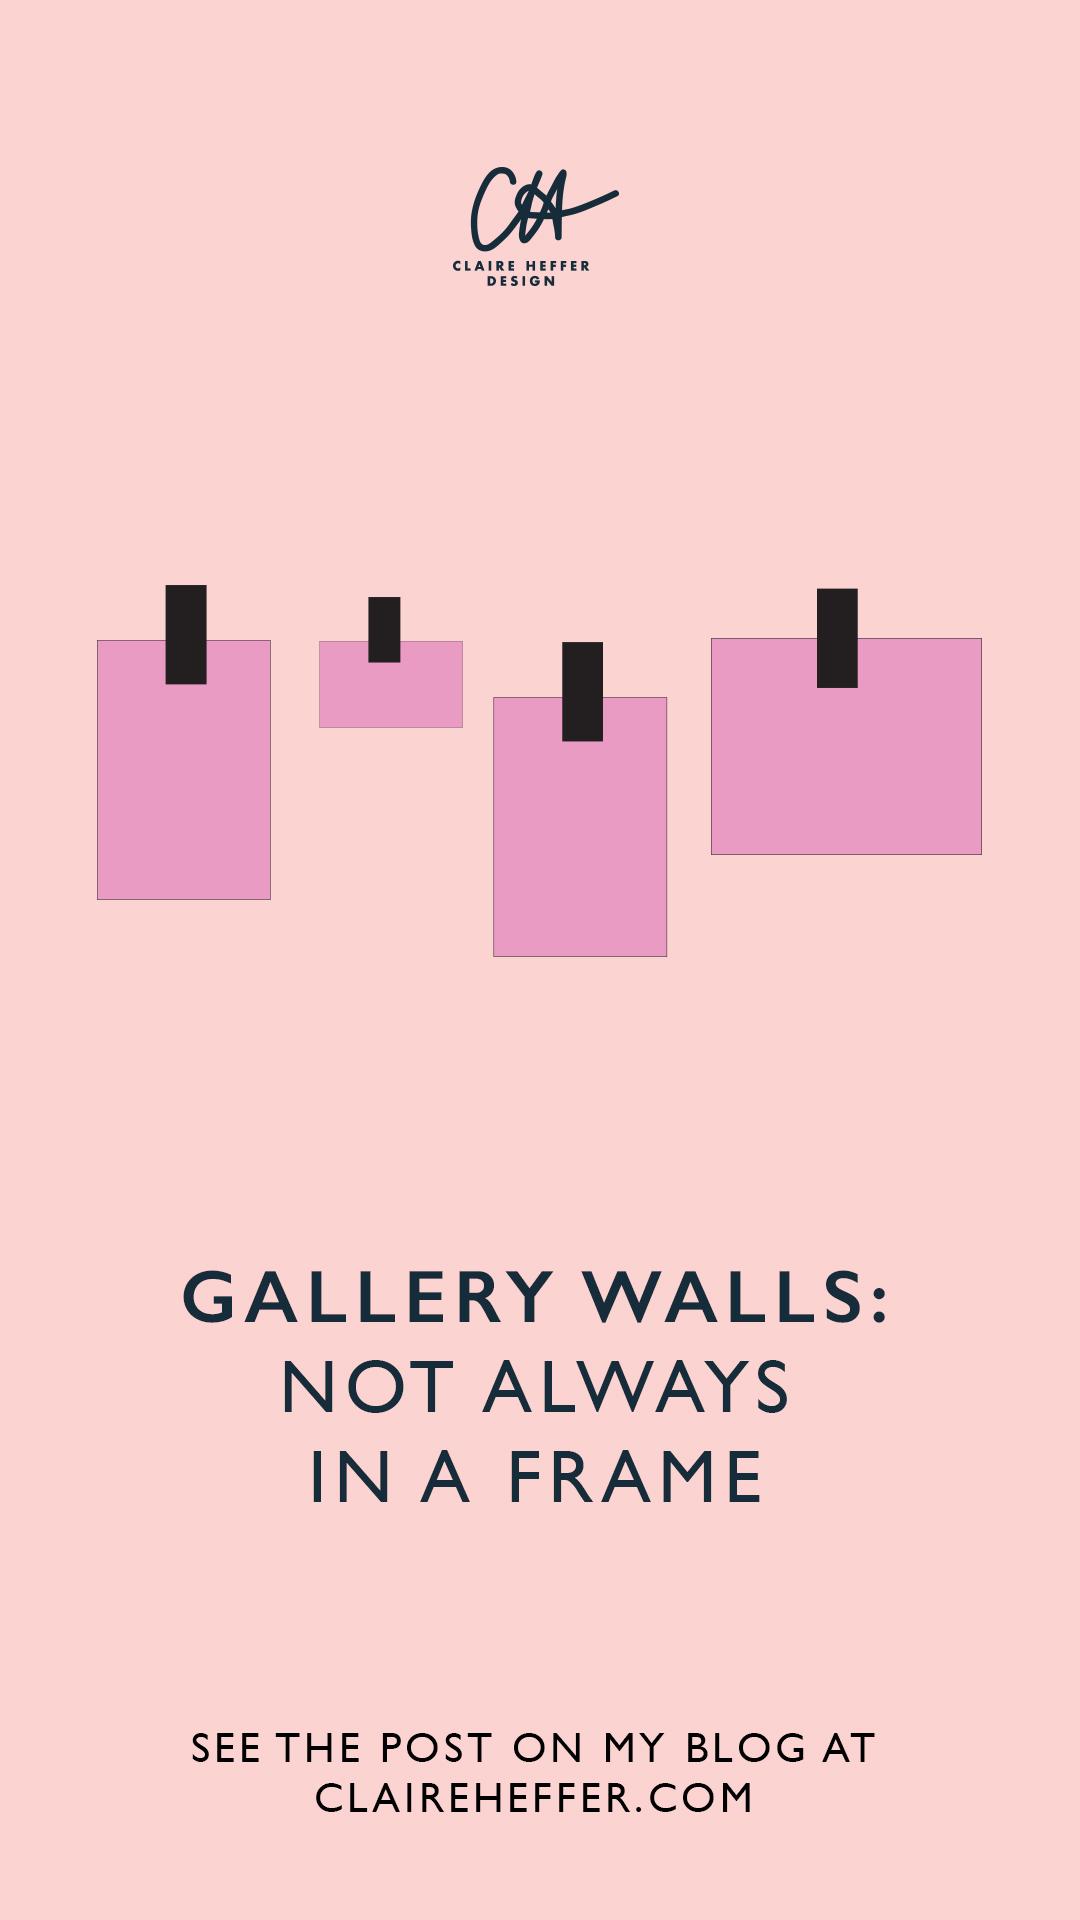 GALLERY WALLS NOT ALWAYS IN A FRAME.jpg